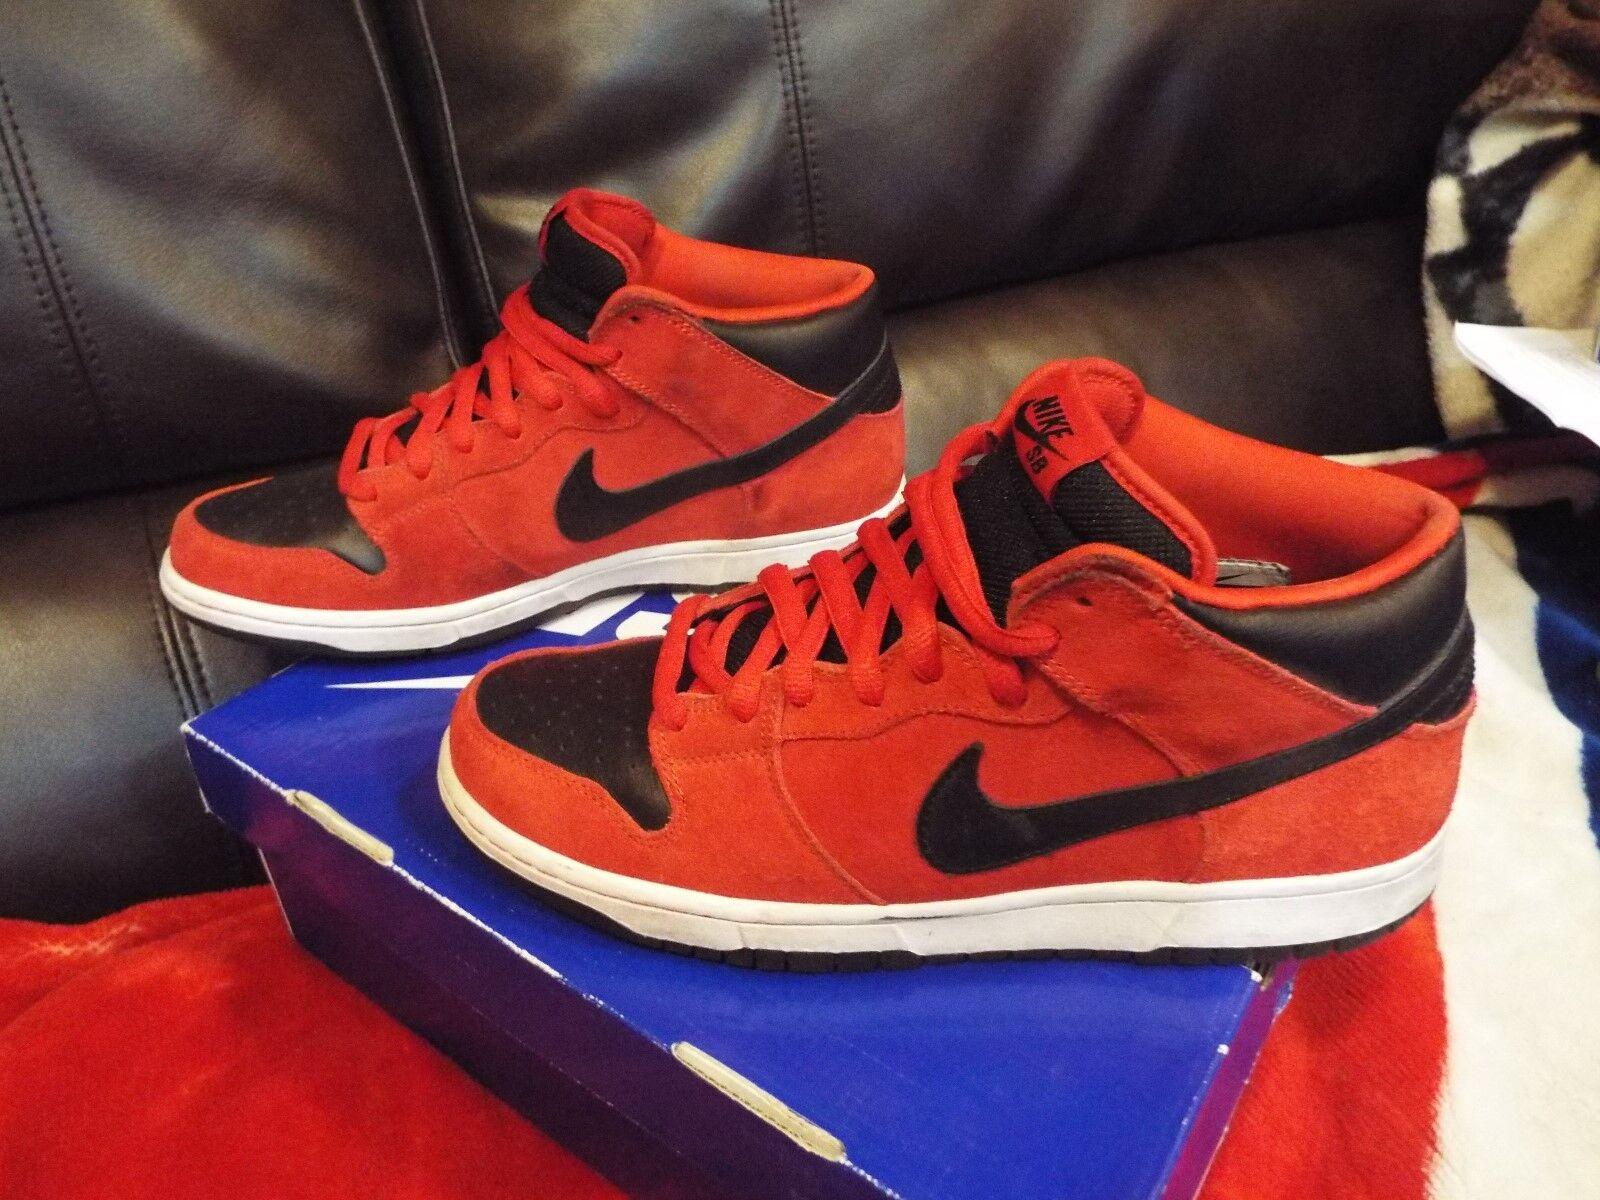 RARE Nike Dunk MID Pro SB Taille 9.5 RARE CONSIDERED DESIGN rouge DEVIL 314383 600